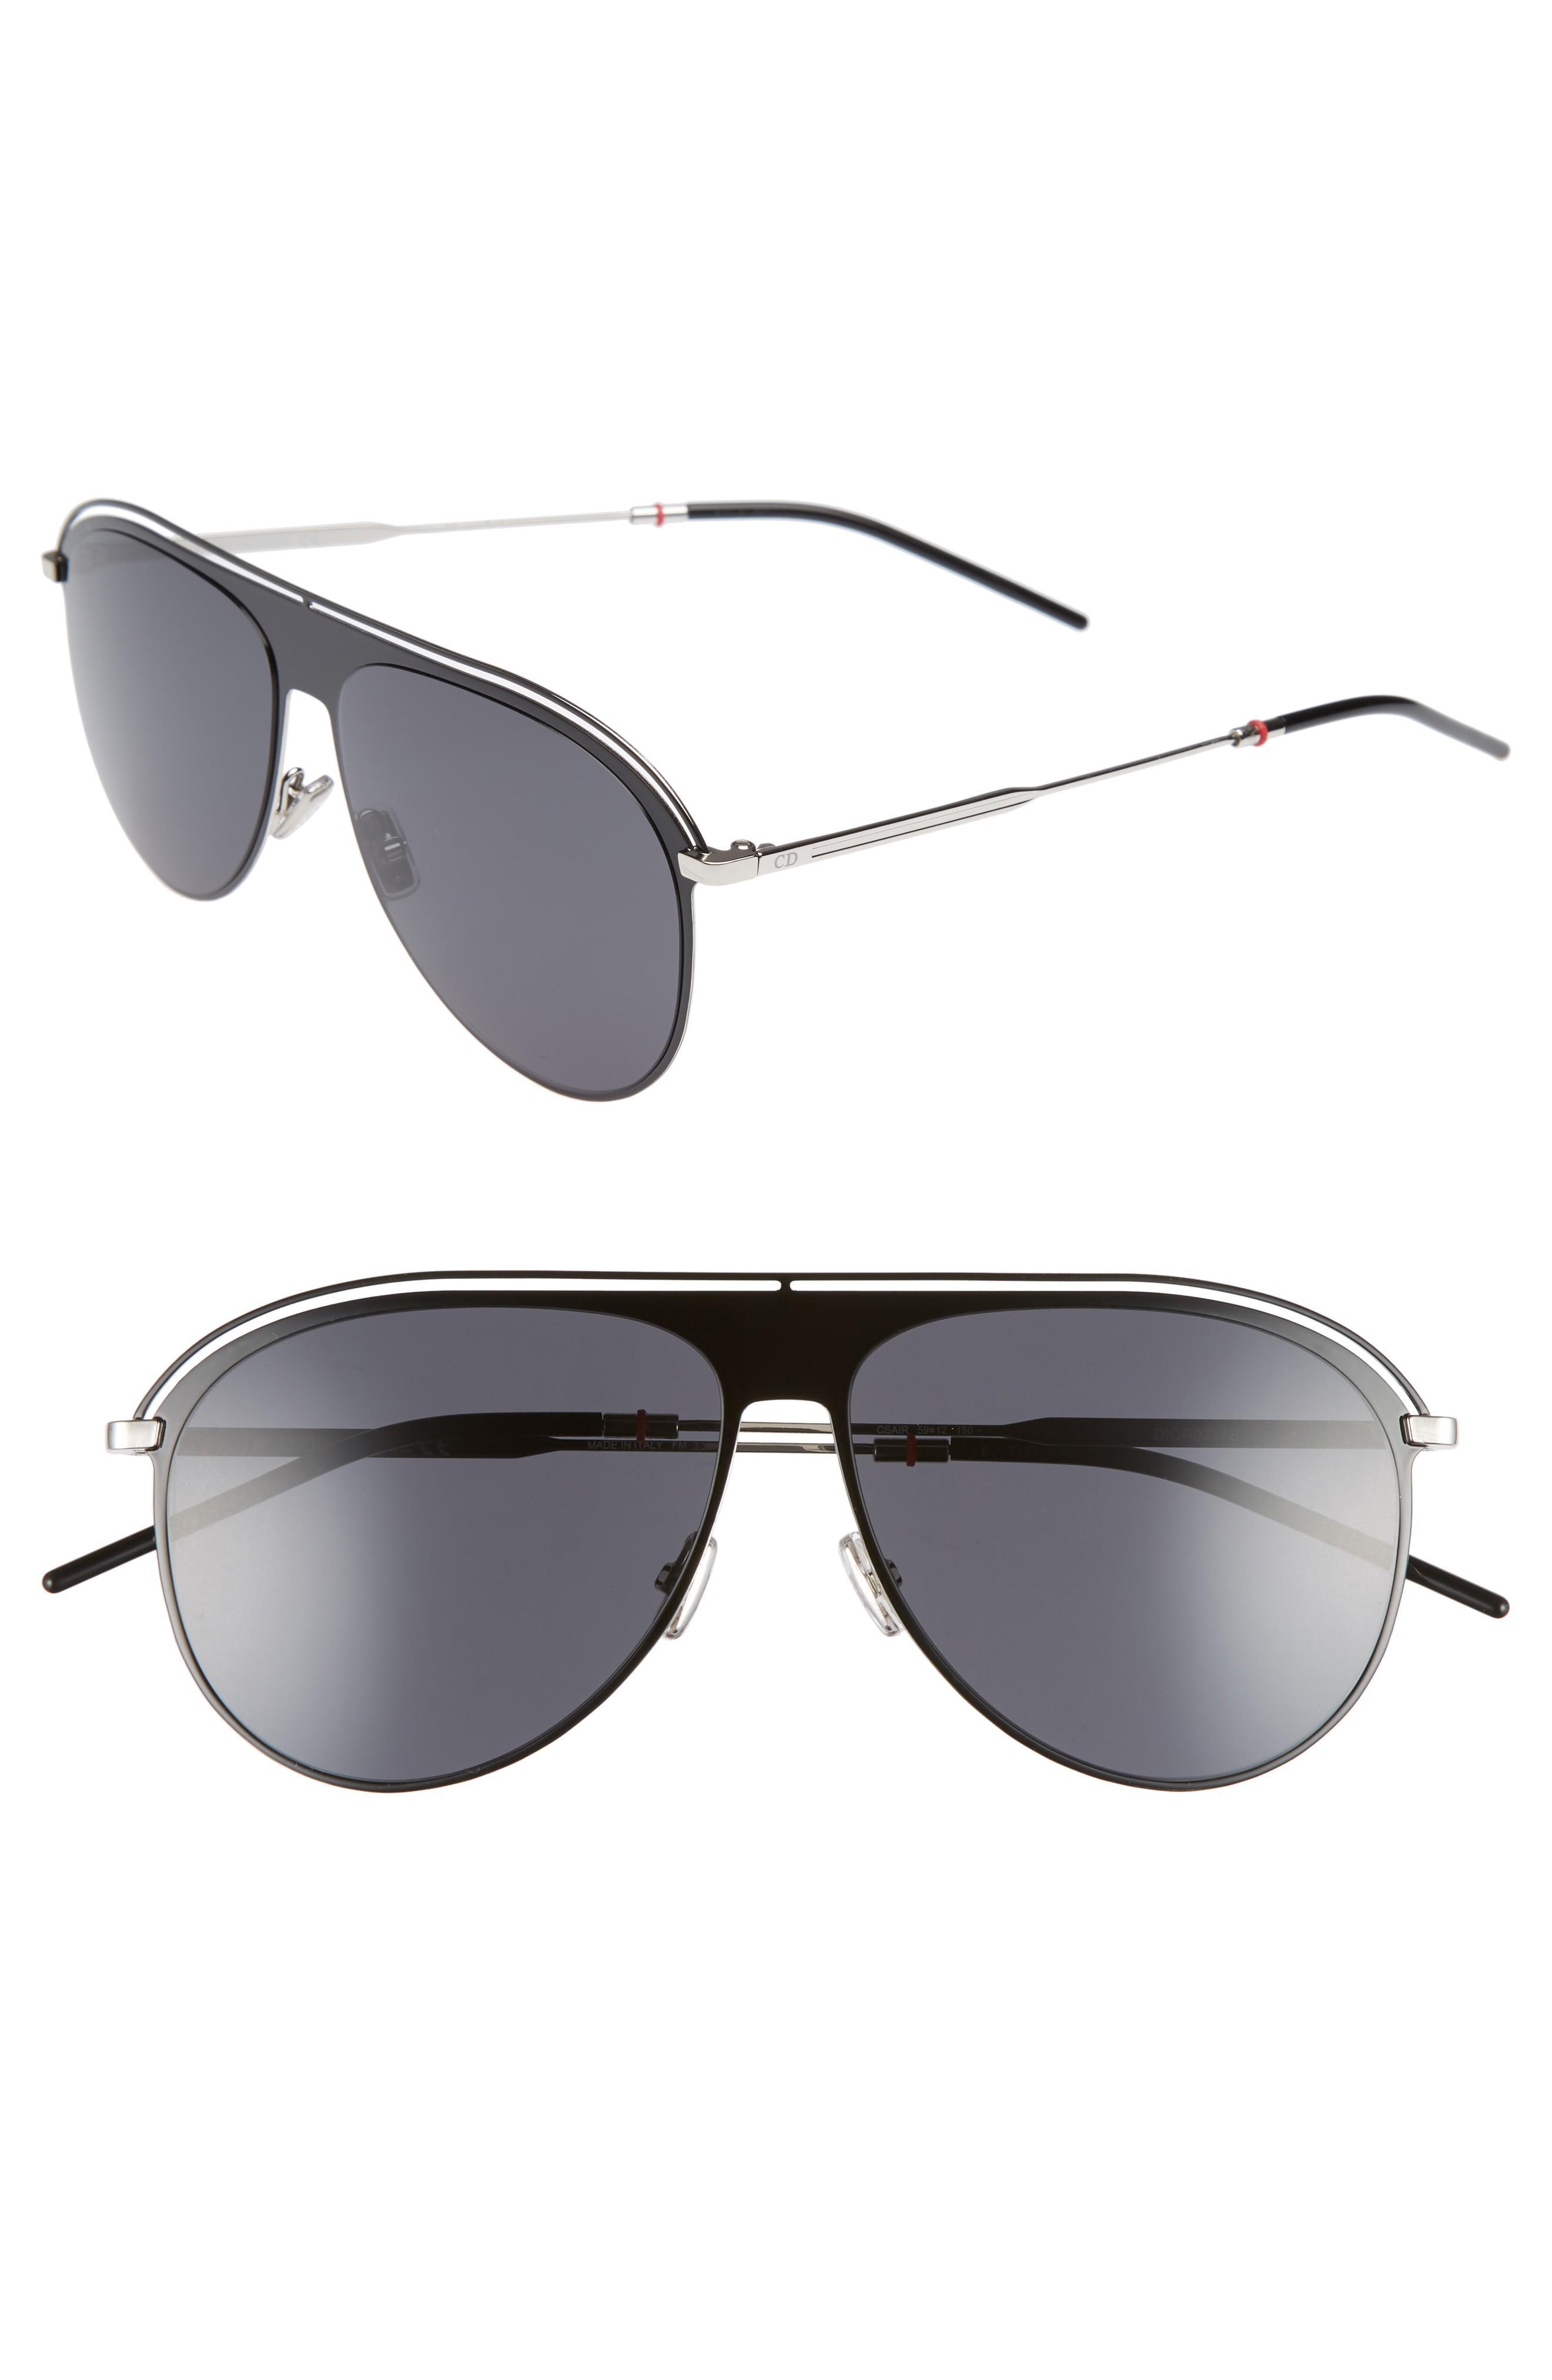 d9c2ead25310 Dior Homme Men s Ultrathin Metal Aviator Pilot Sunglasses In Black Palladium